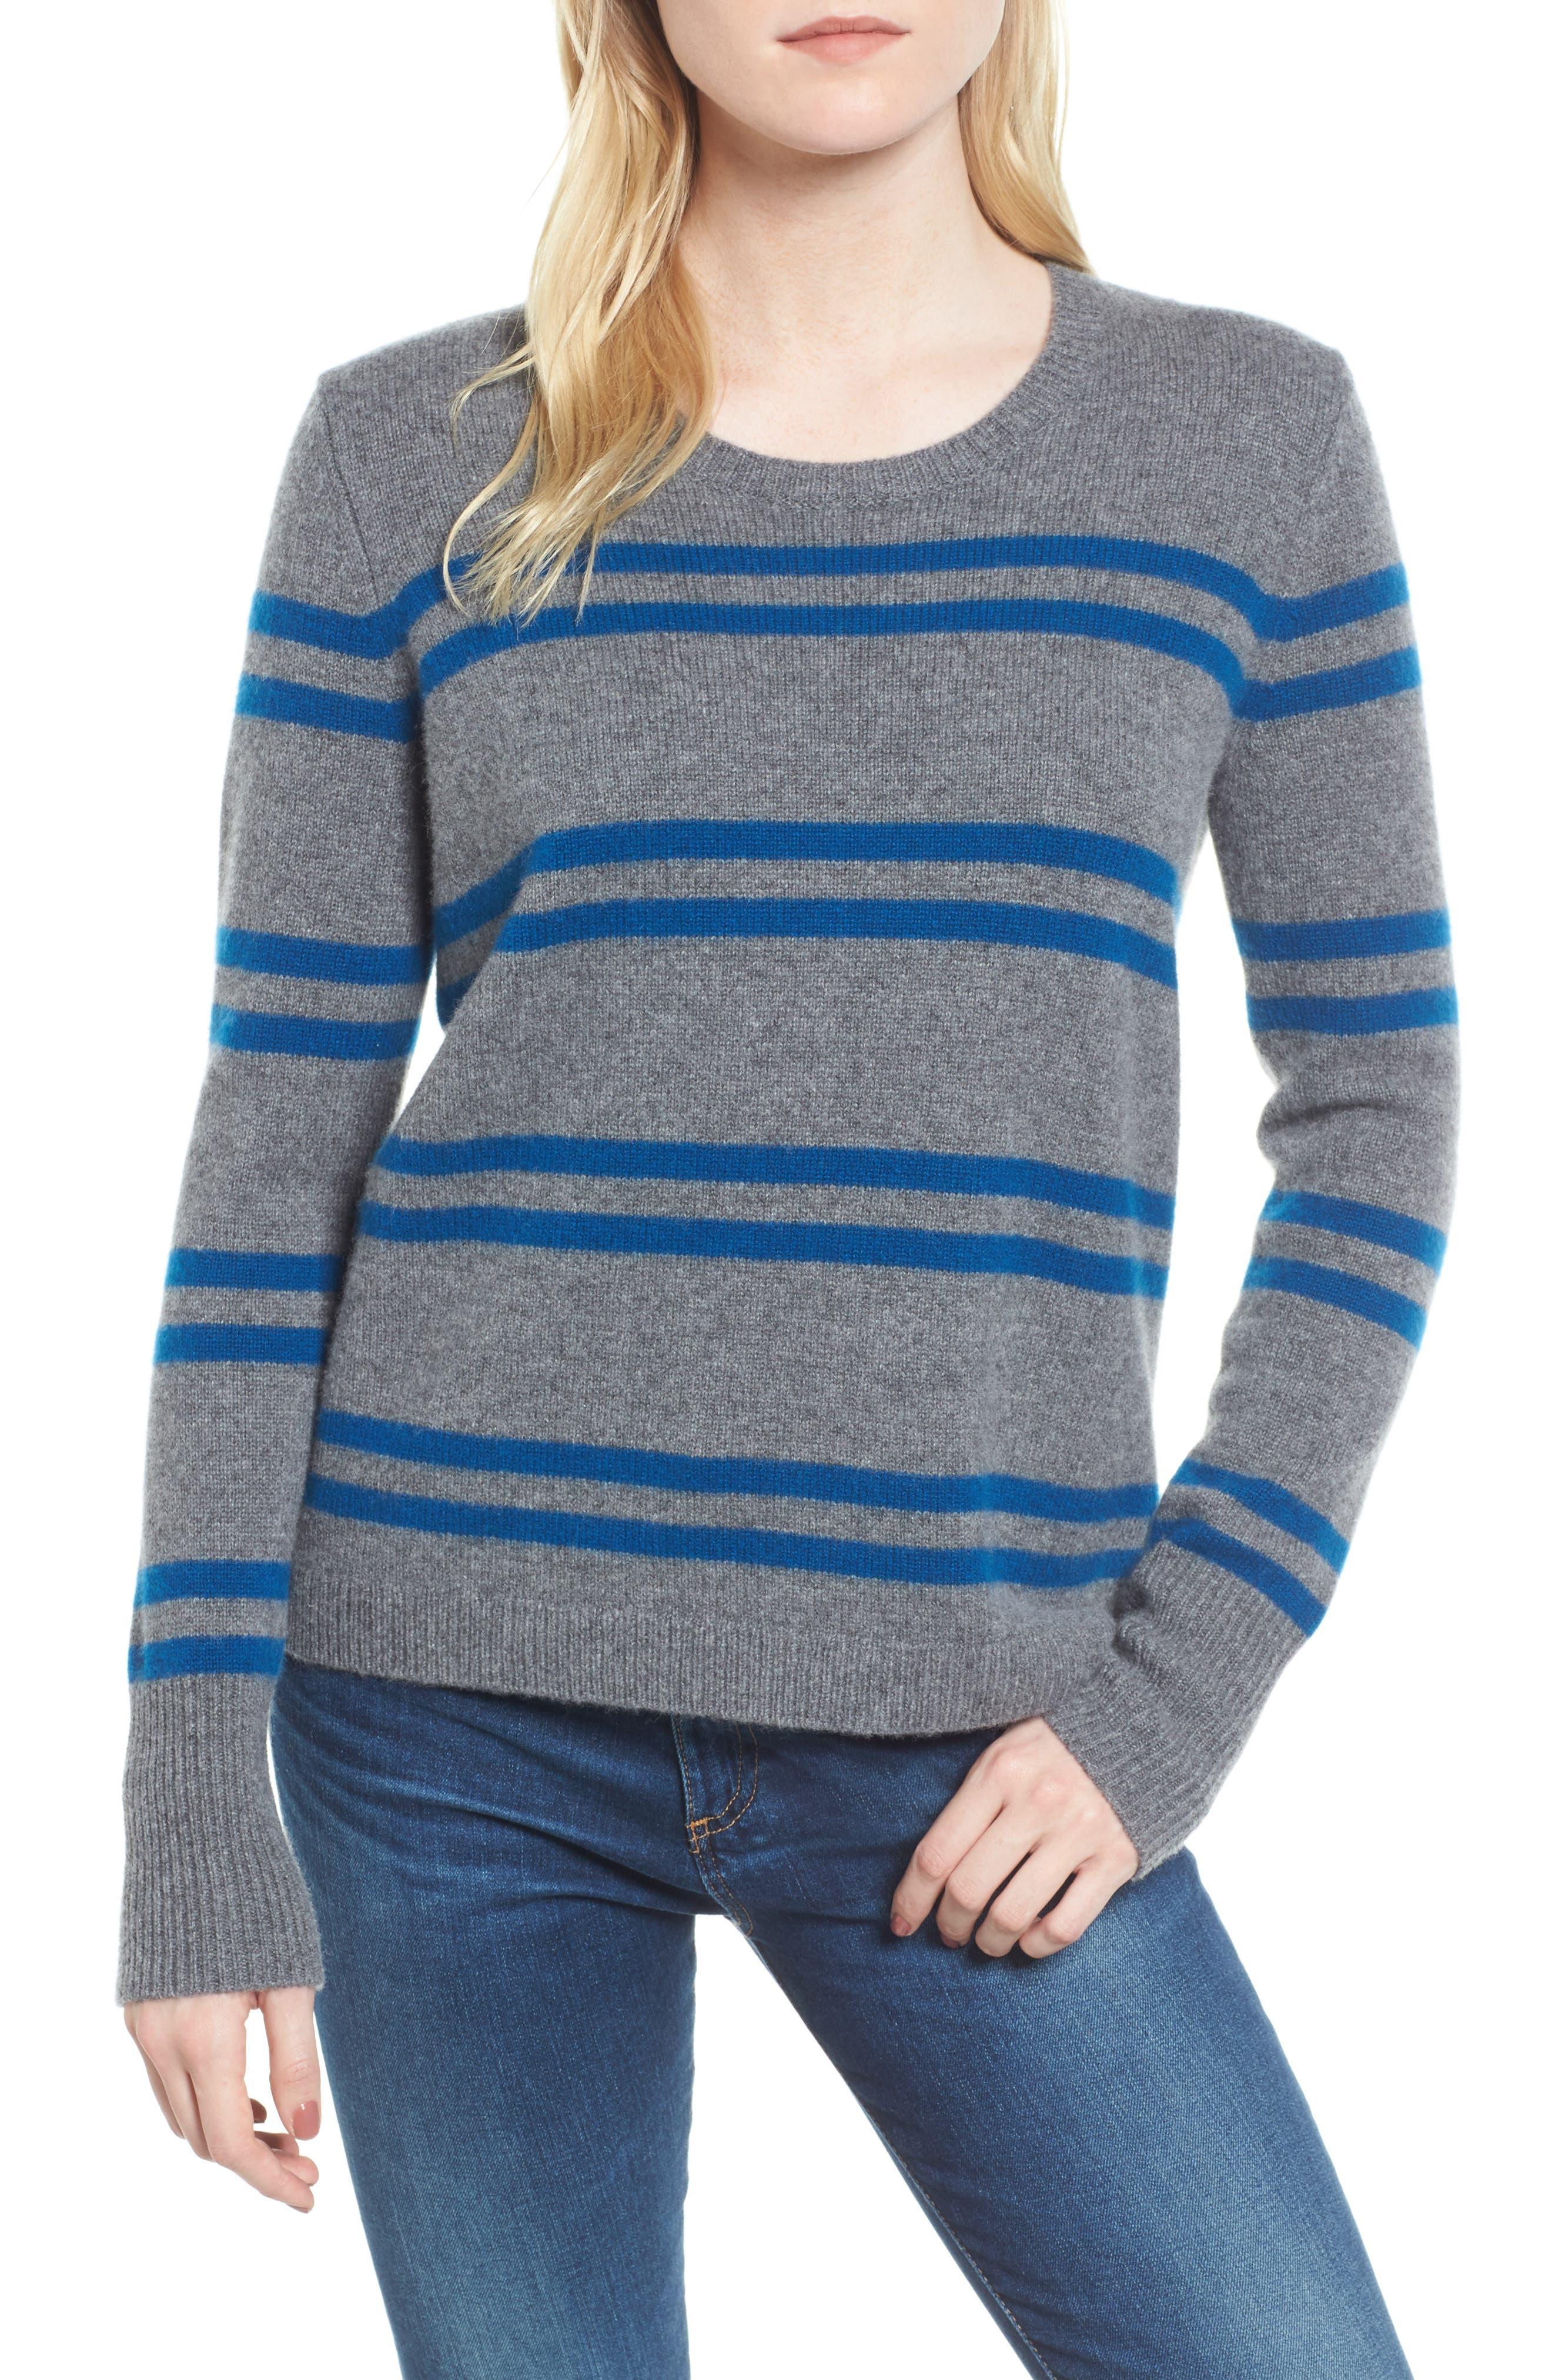 Alternate Image 1 Selected - James Perse Stripe Cashmere Sweatshirt